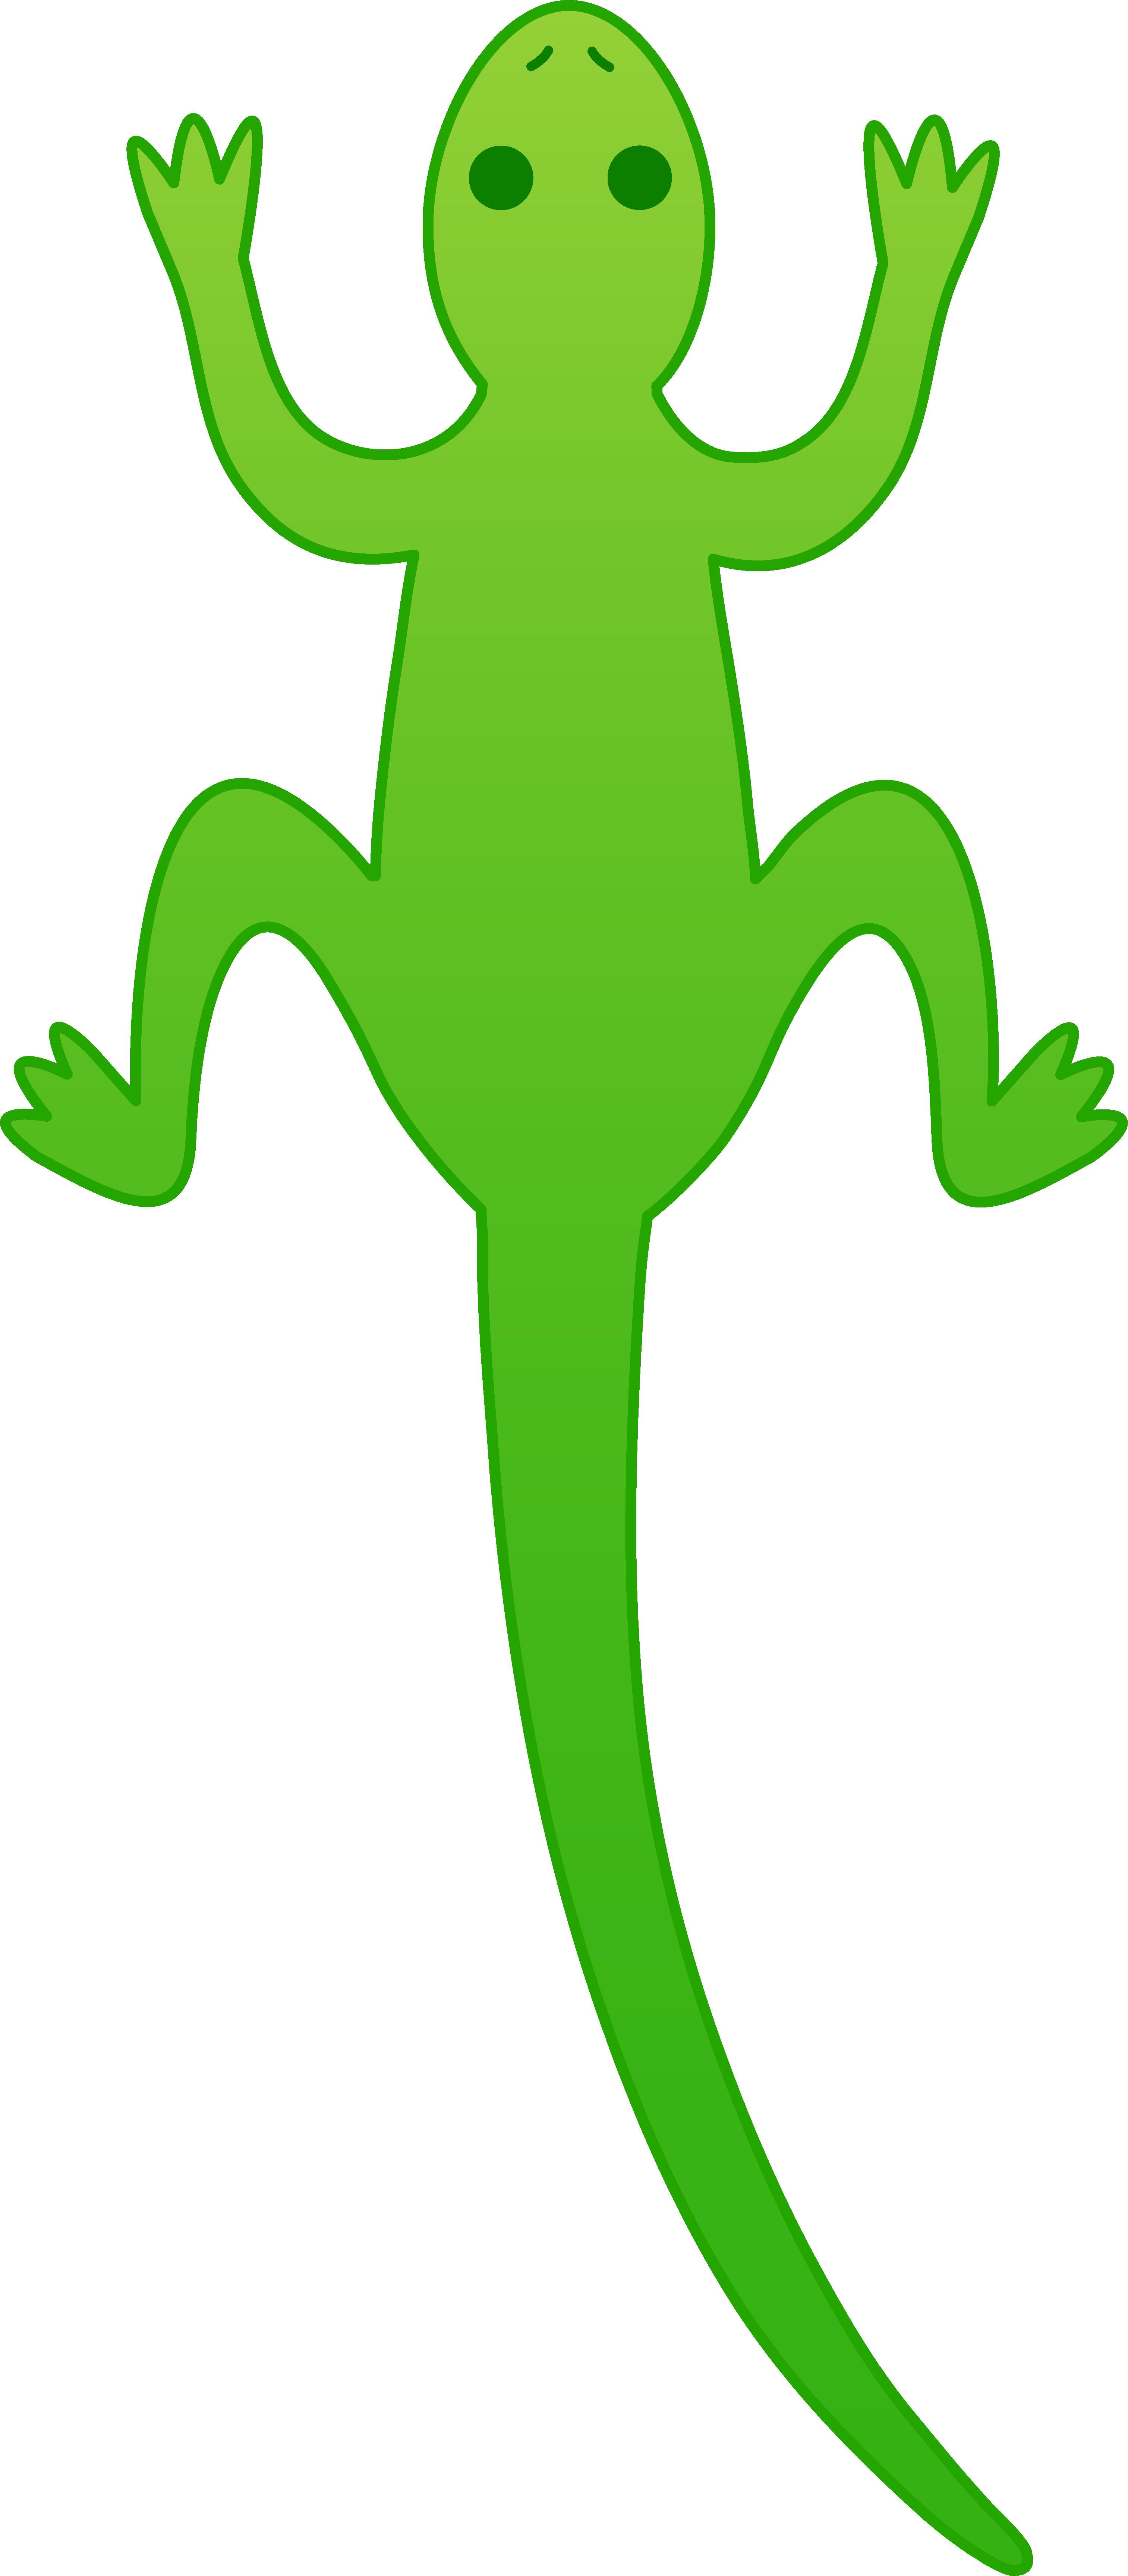 Lizard clipart #6, Download drawings